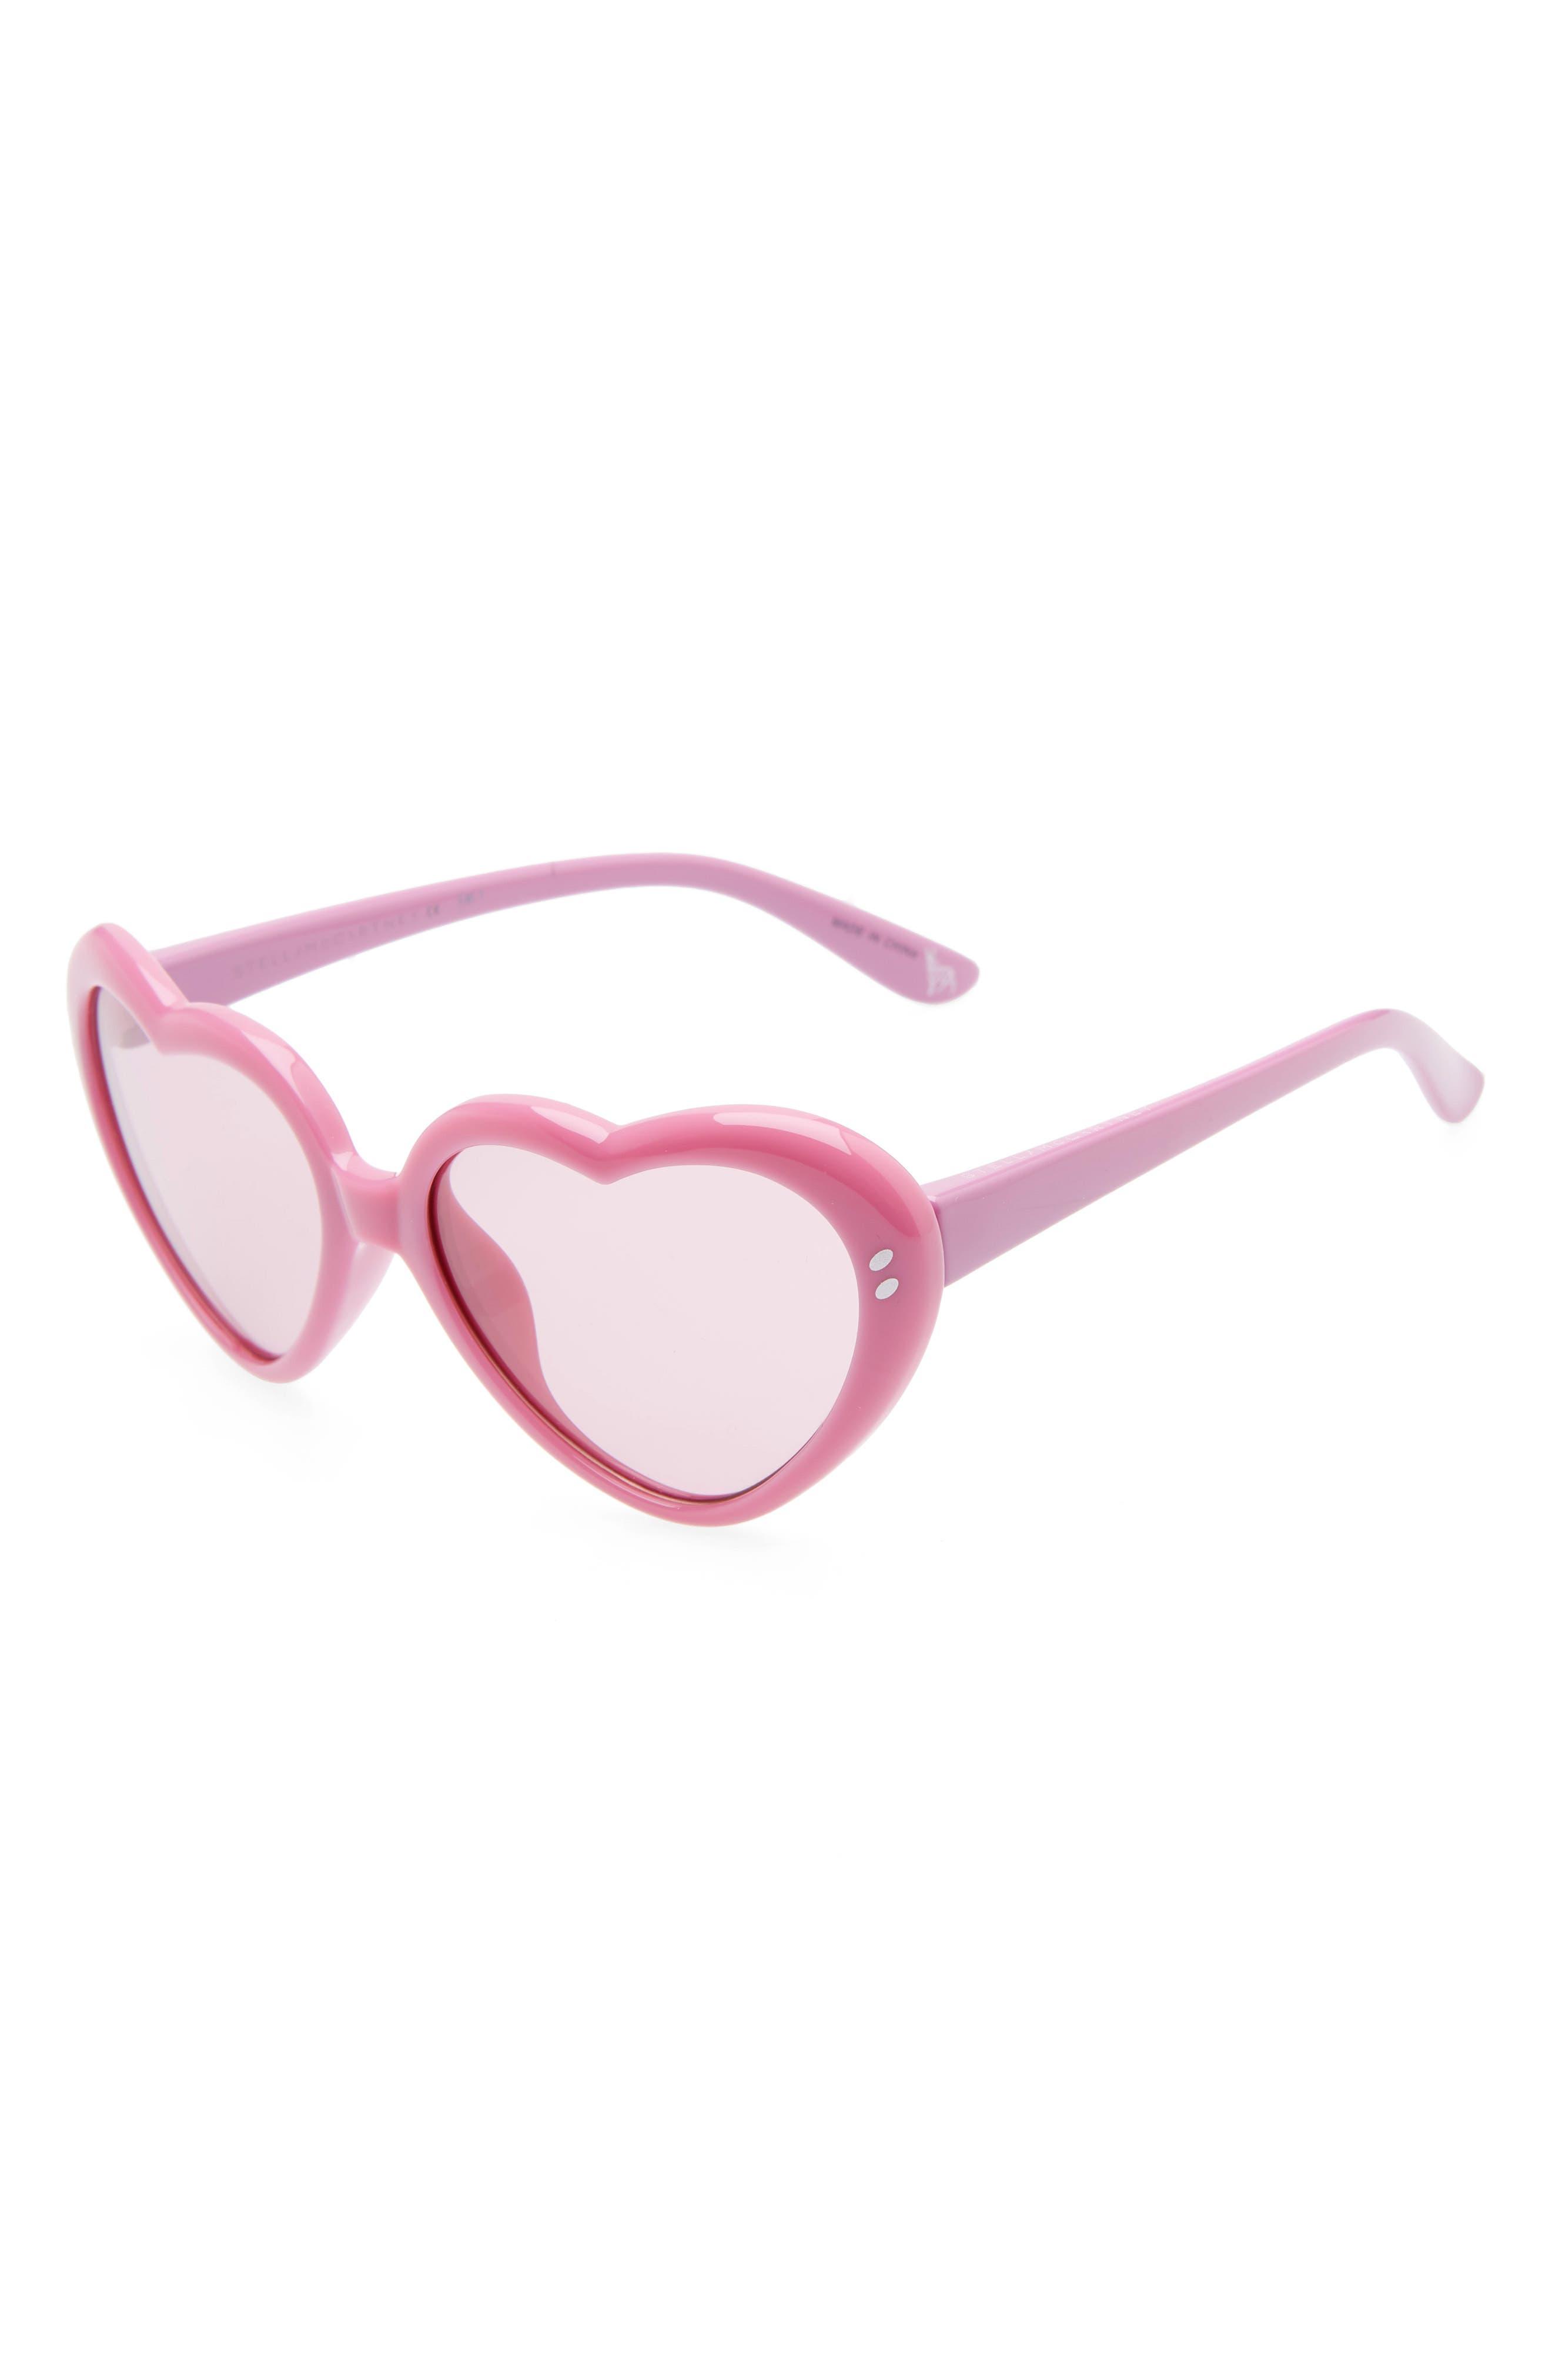 STELLA MCCARTNEY KIDS, 49mm Heart Sunglasses, Main thumbnail 1, color, 514